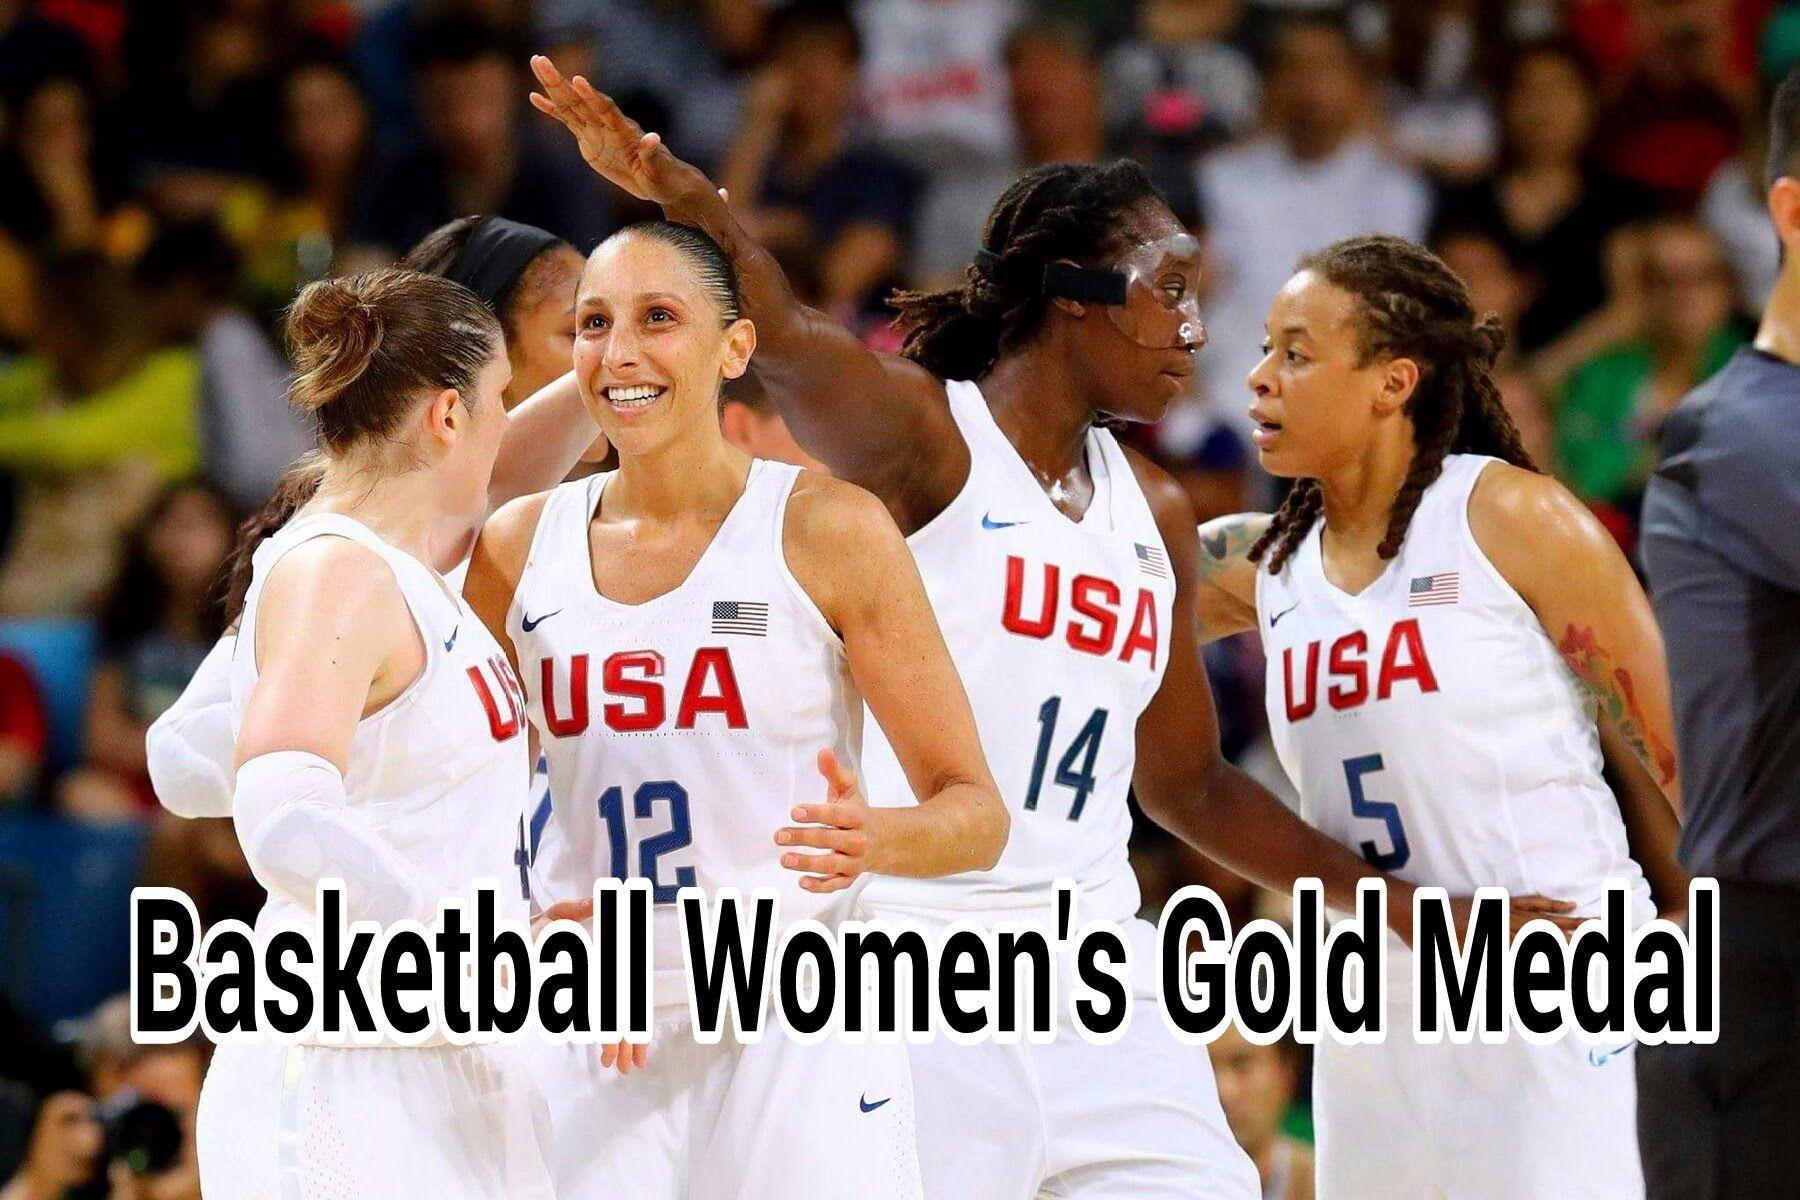 USA vs Spain Final Basketball Women's 2016 Hightlights